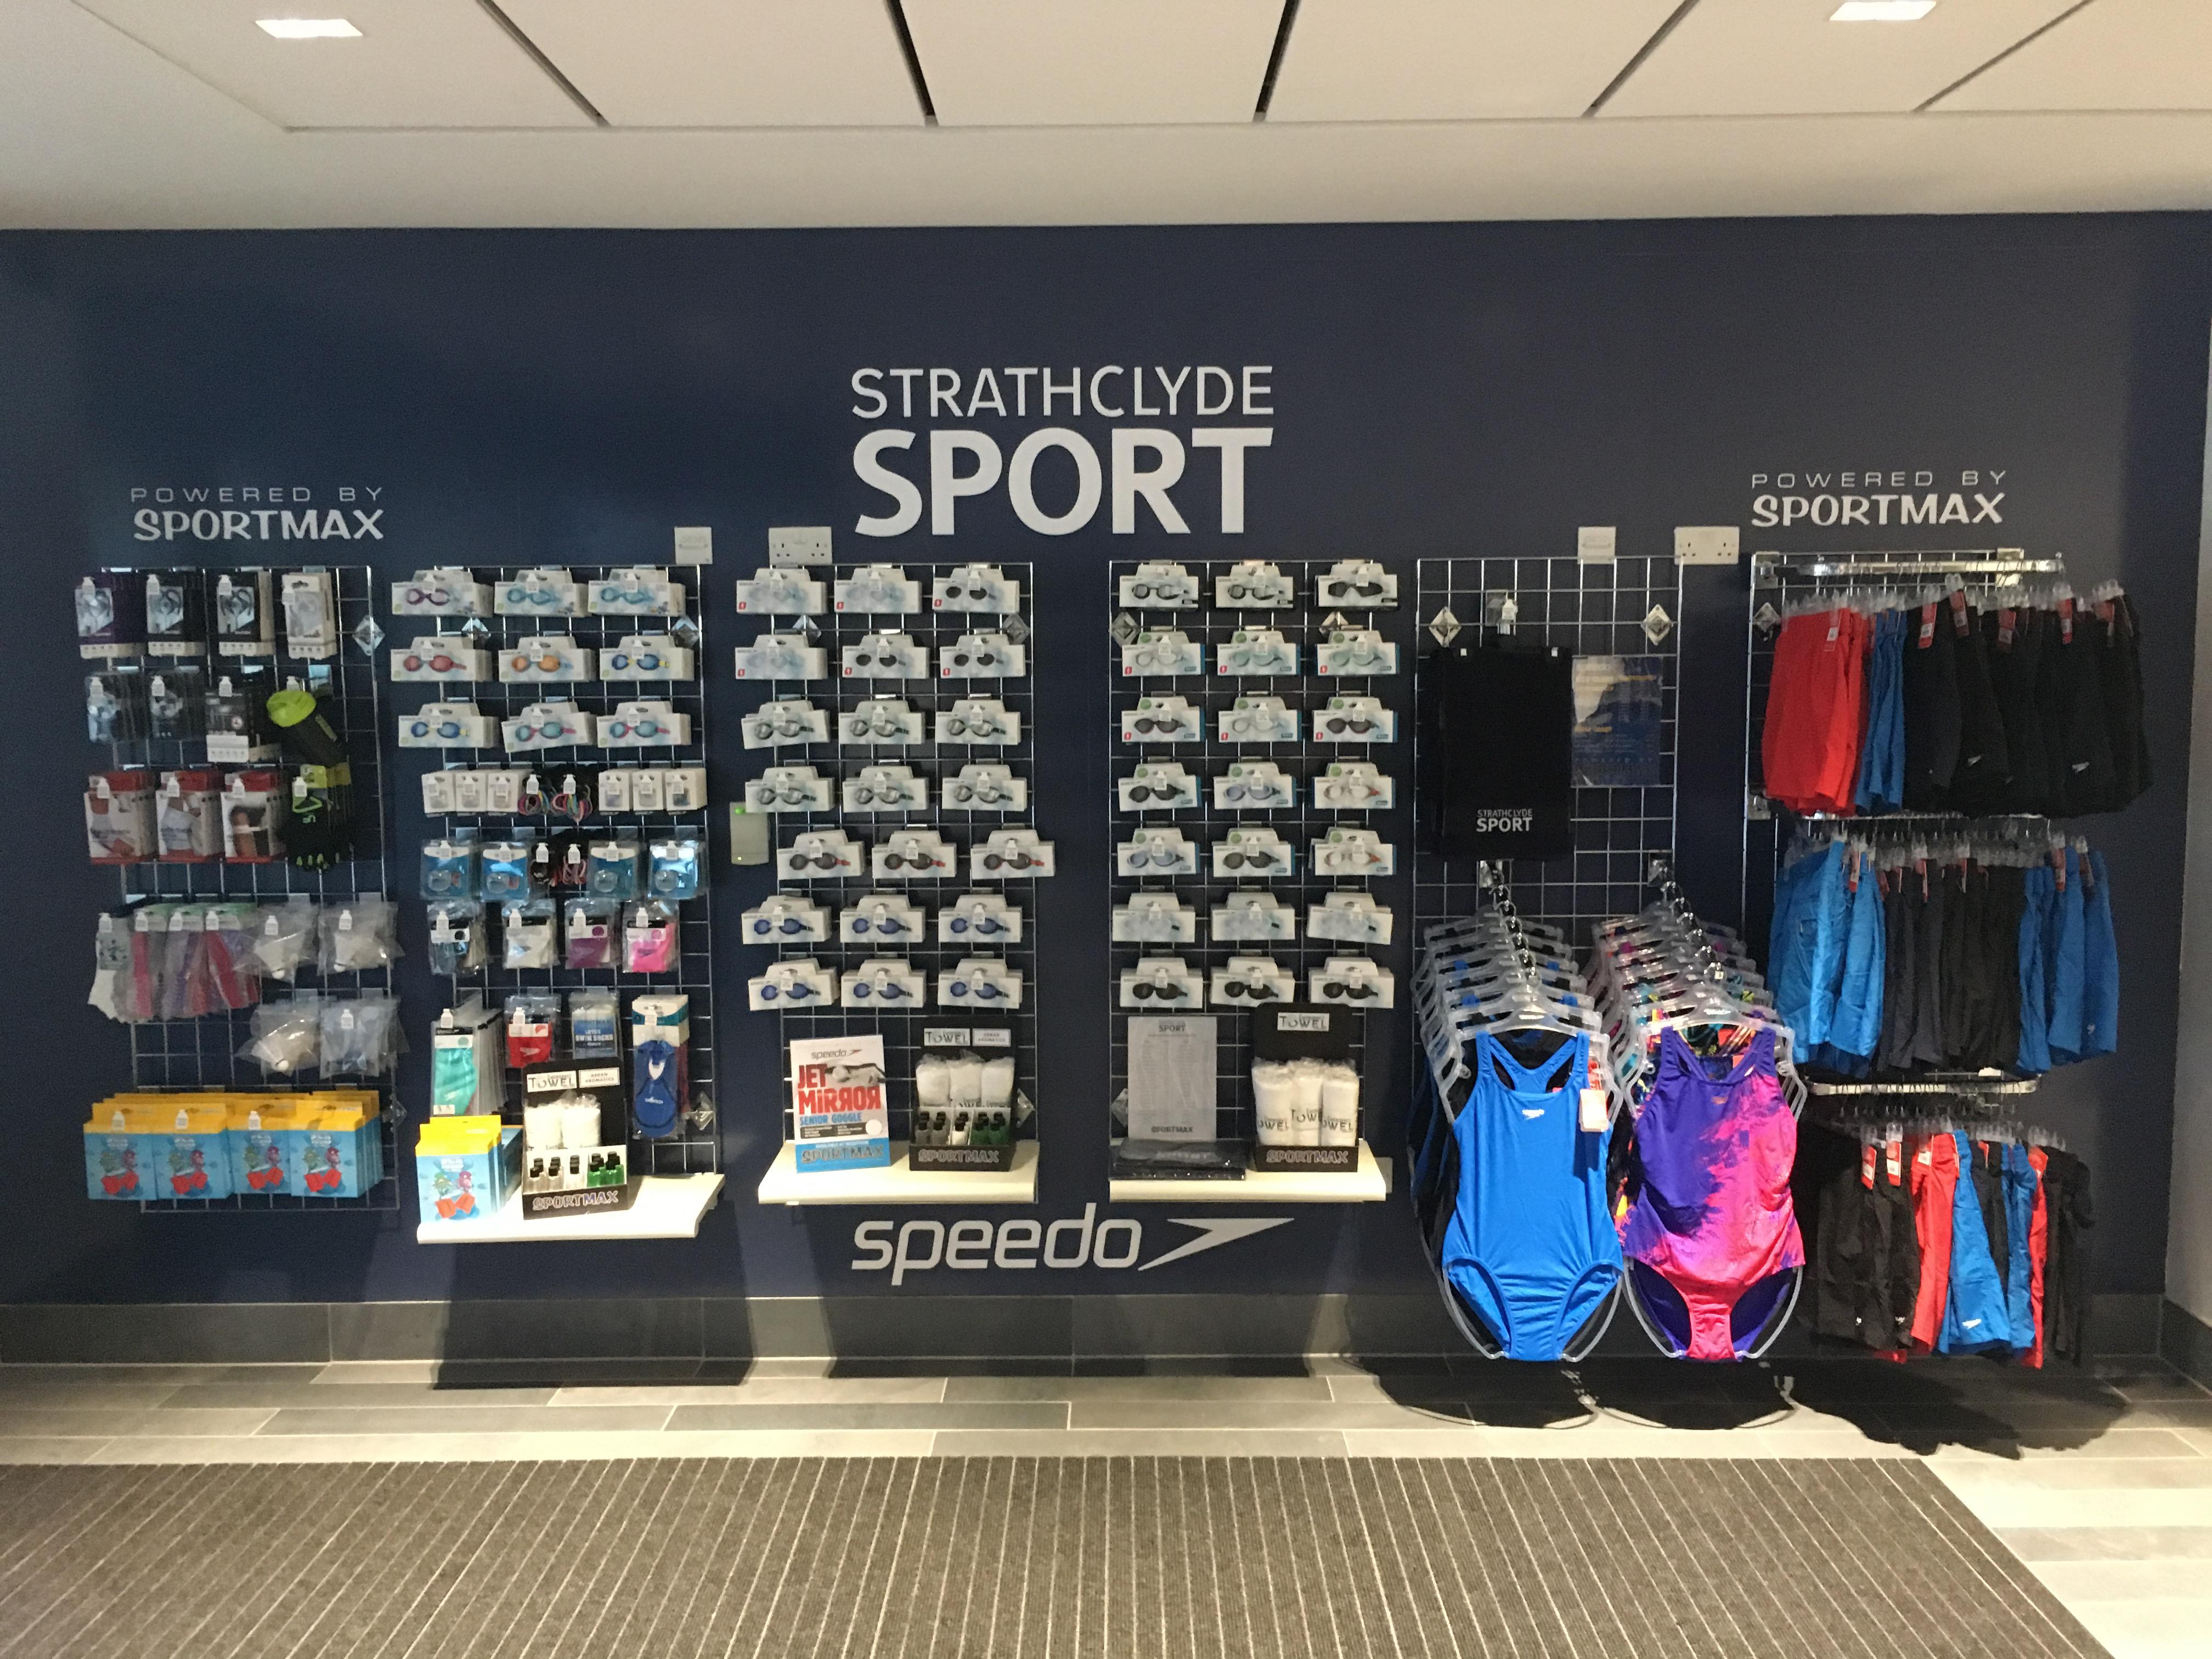 strathclyde sport speedo shop sportmax